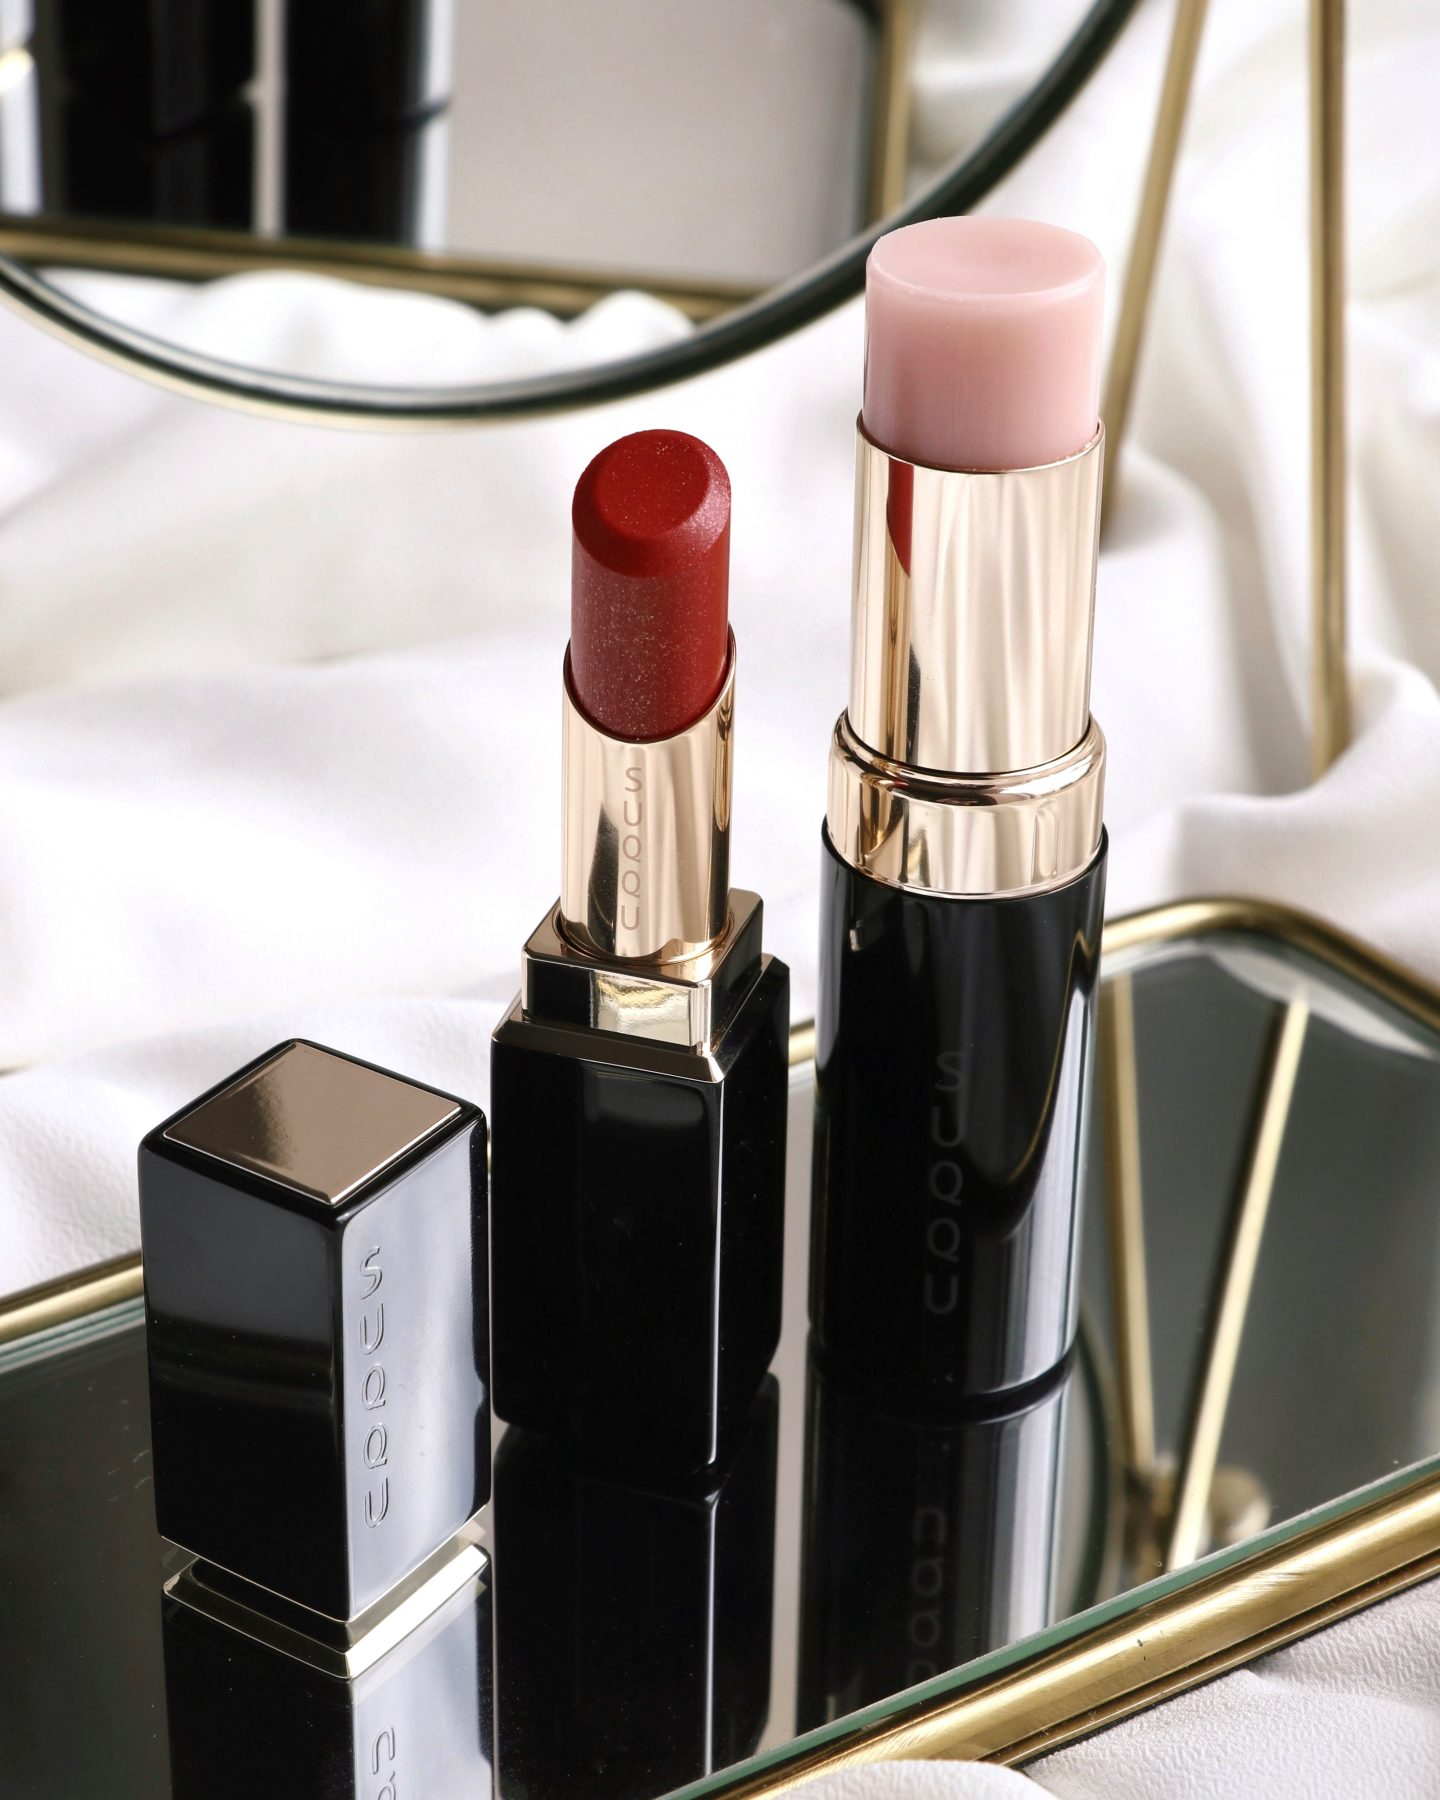 SUQQU AW20 Colour Collection Moisture Rich Lipstick